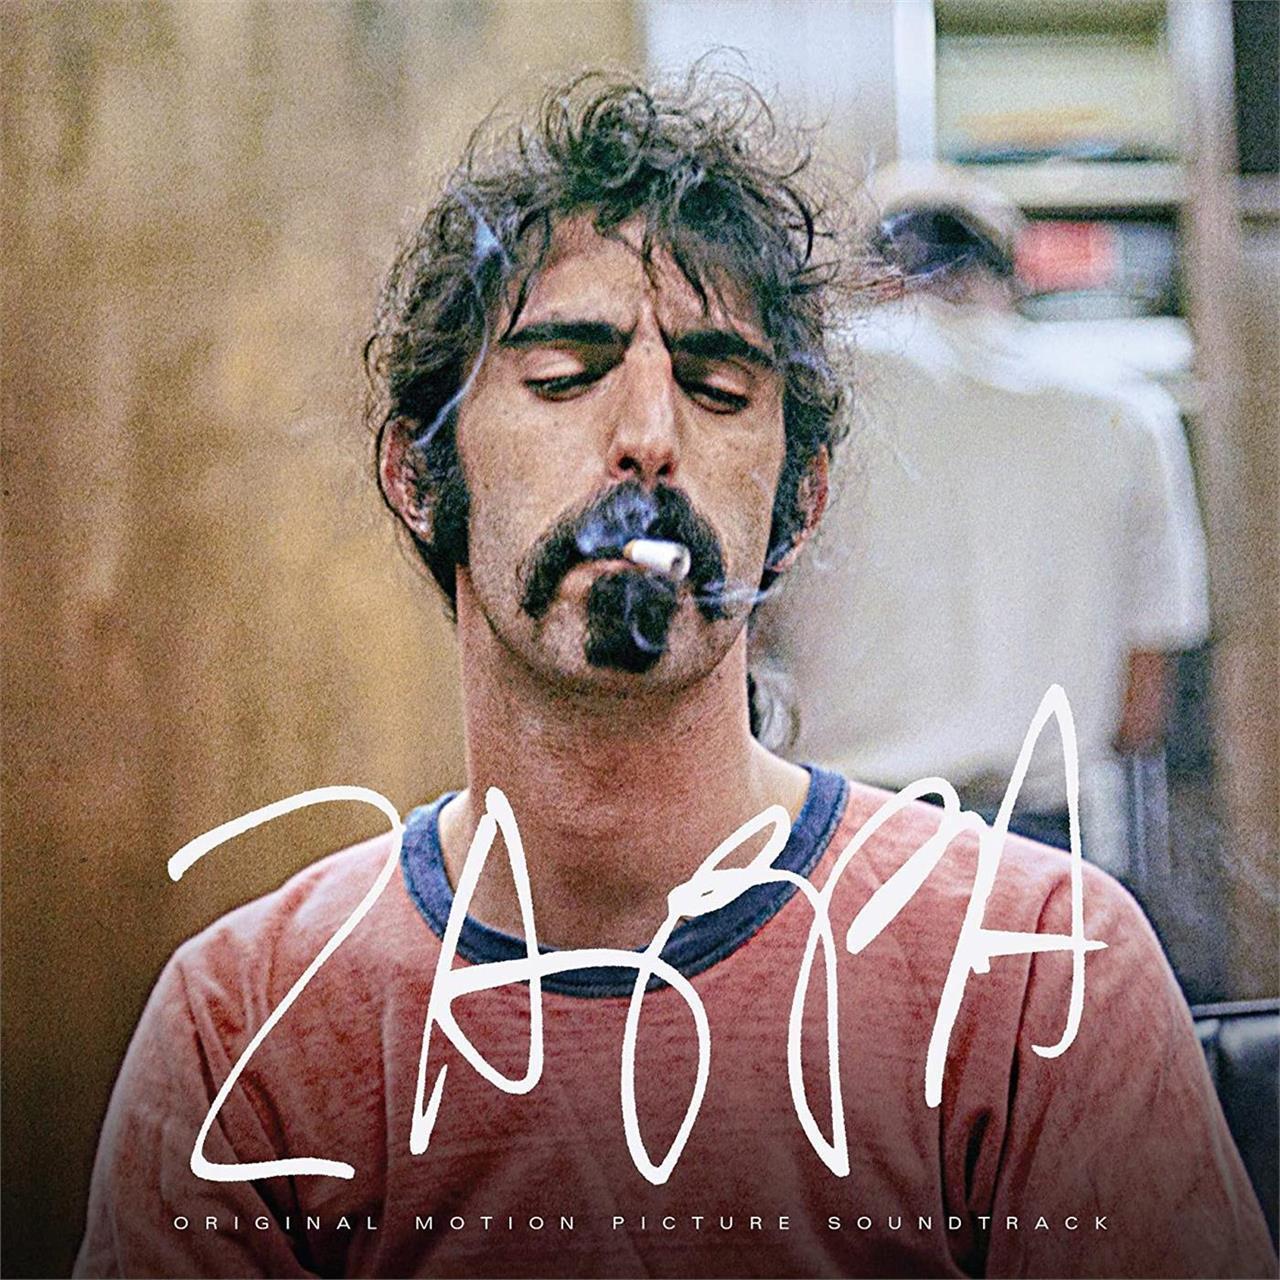 Frank Zappa - Zappa Original Motion Picture Soundtrack [2xLP] (Crystal Clear Vinyl)